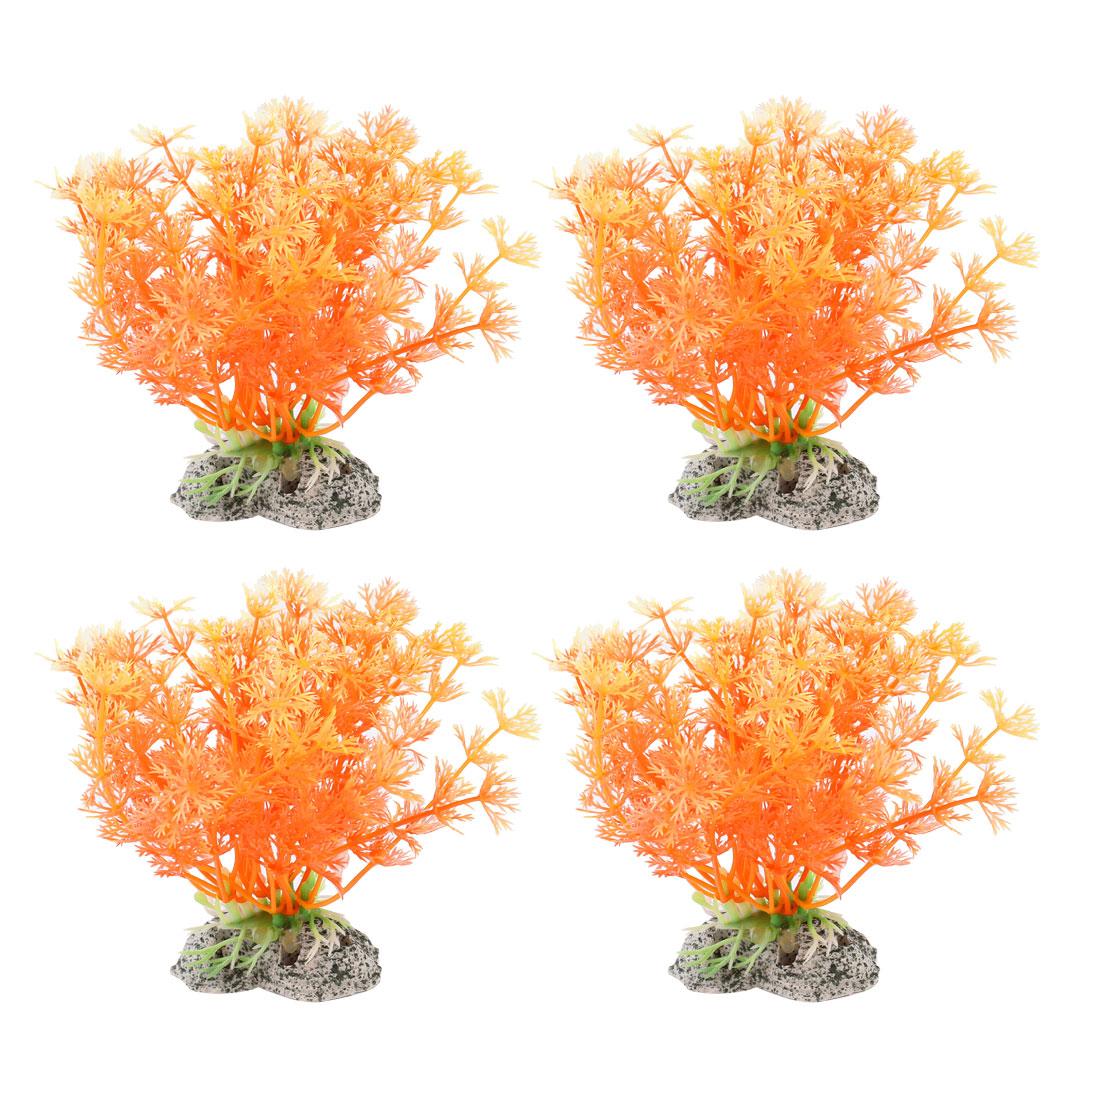 "Aquarium Emulational Grass Plant Ornament 4.3"" Height Orange 4 Pcs"